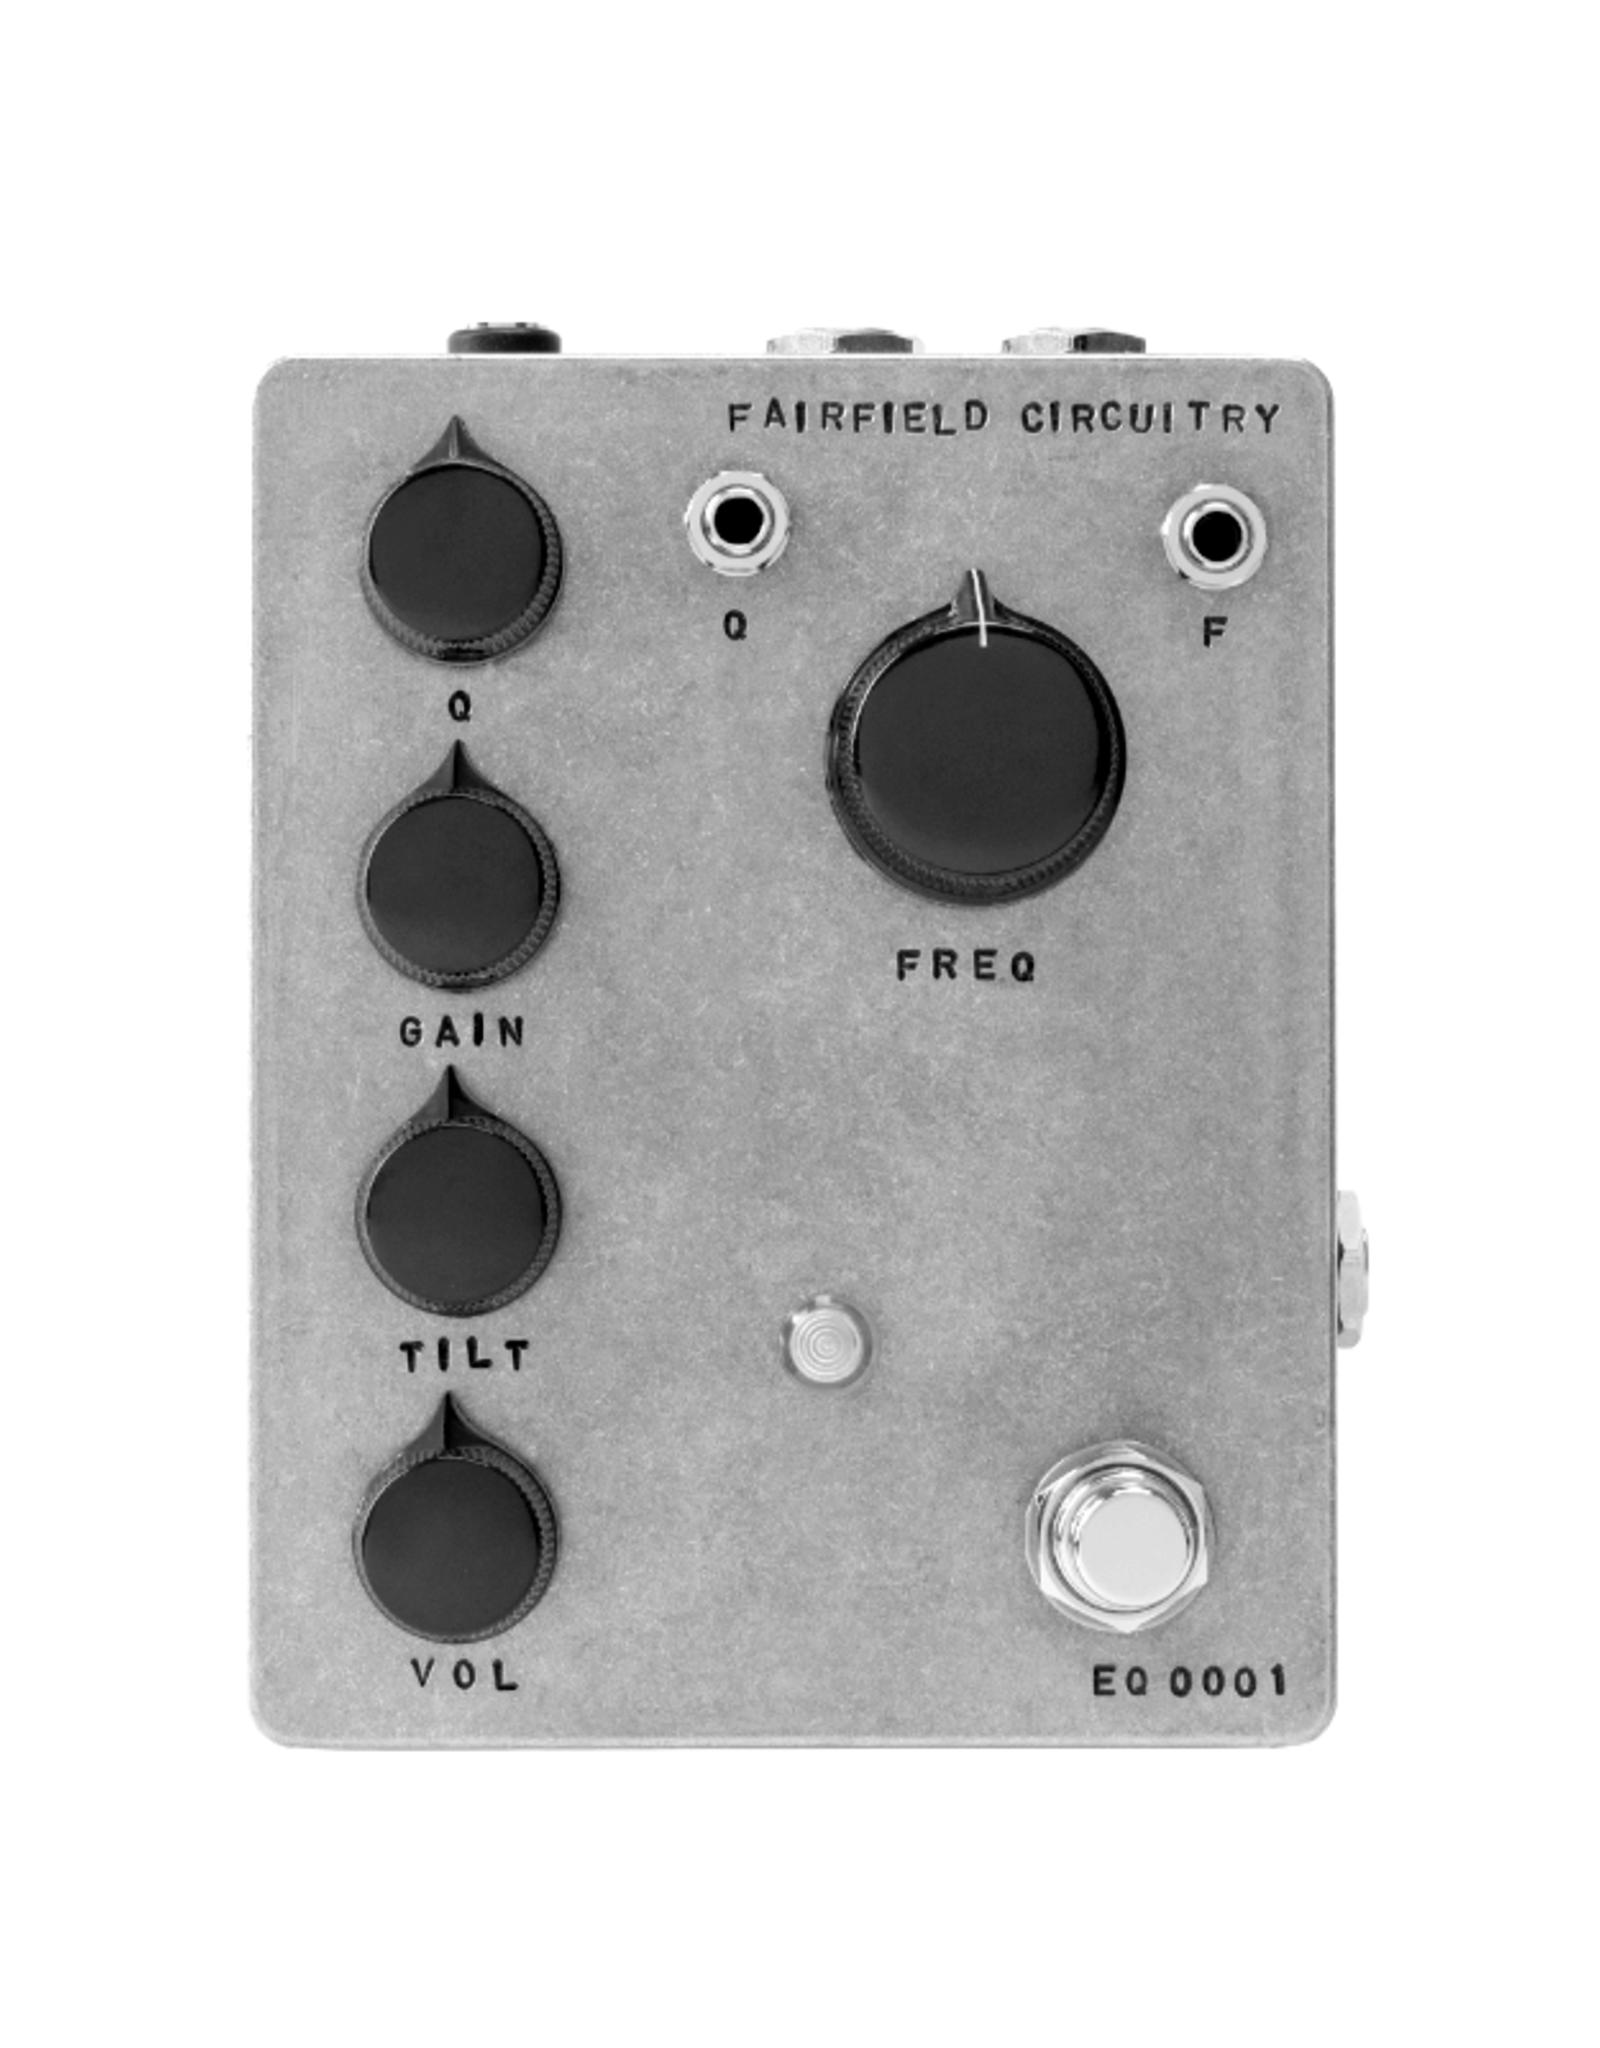 Fairfield Circuitry Fairfield Circuitry Long Life, Parametric EQ w/ Tilt & CV